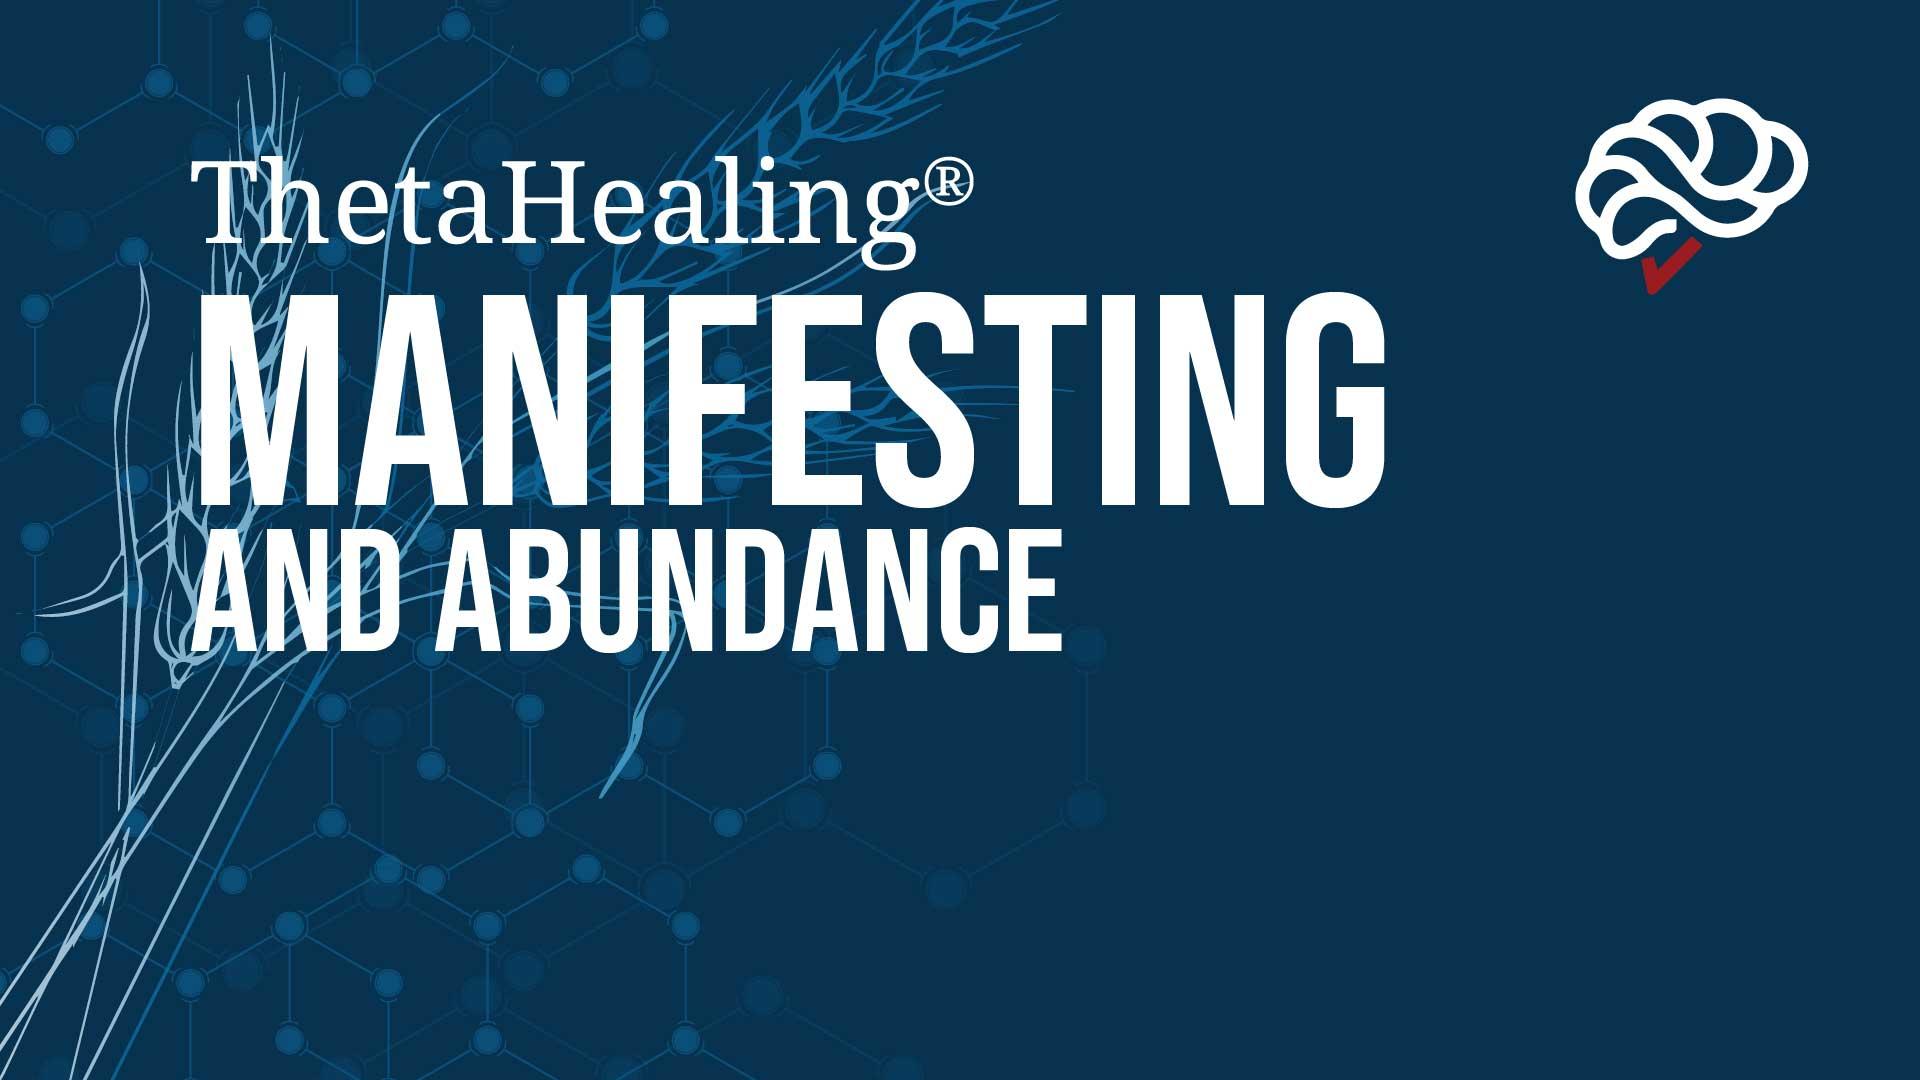 ThetaHealing Manifesting And Abundance Course banner